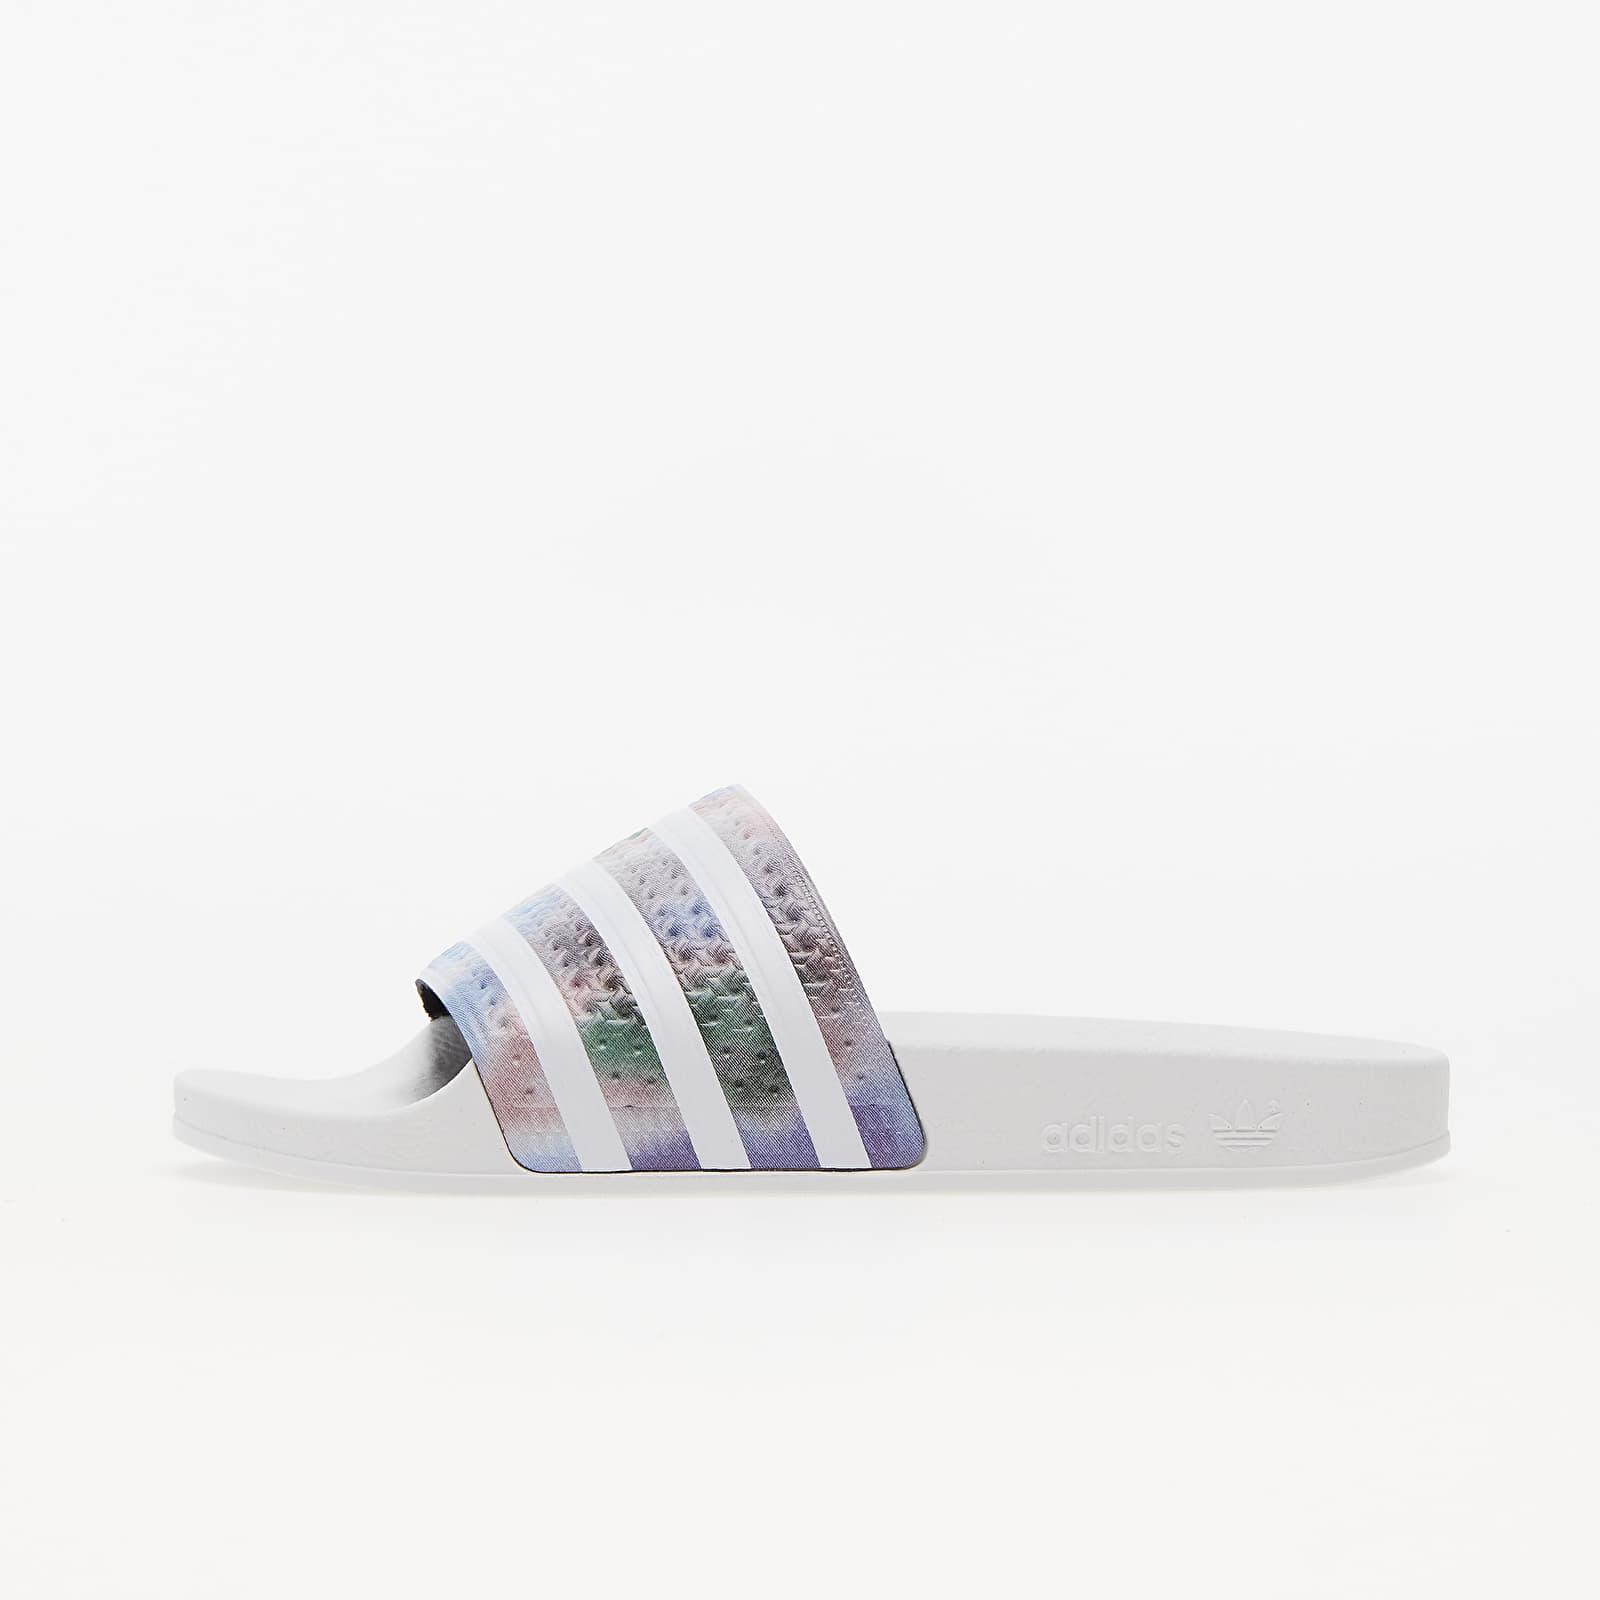 adidas Adilette W Ftw White/ Ftw White/ Halo Mint EUR 42